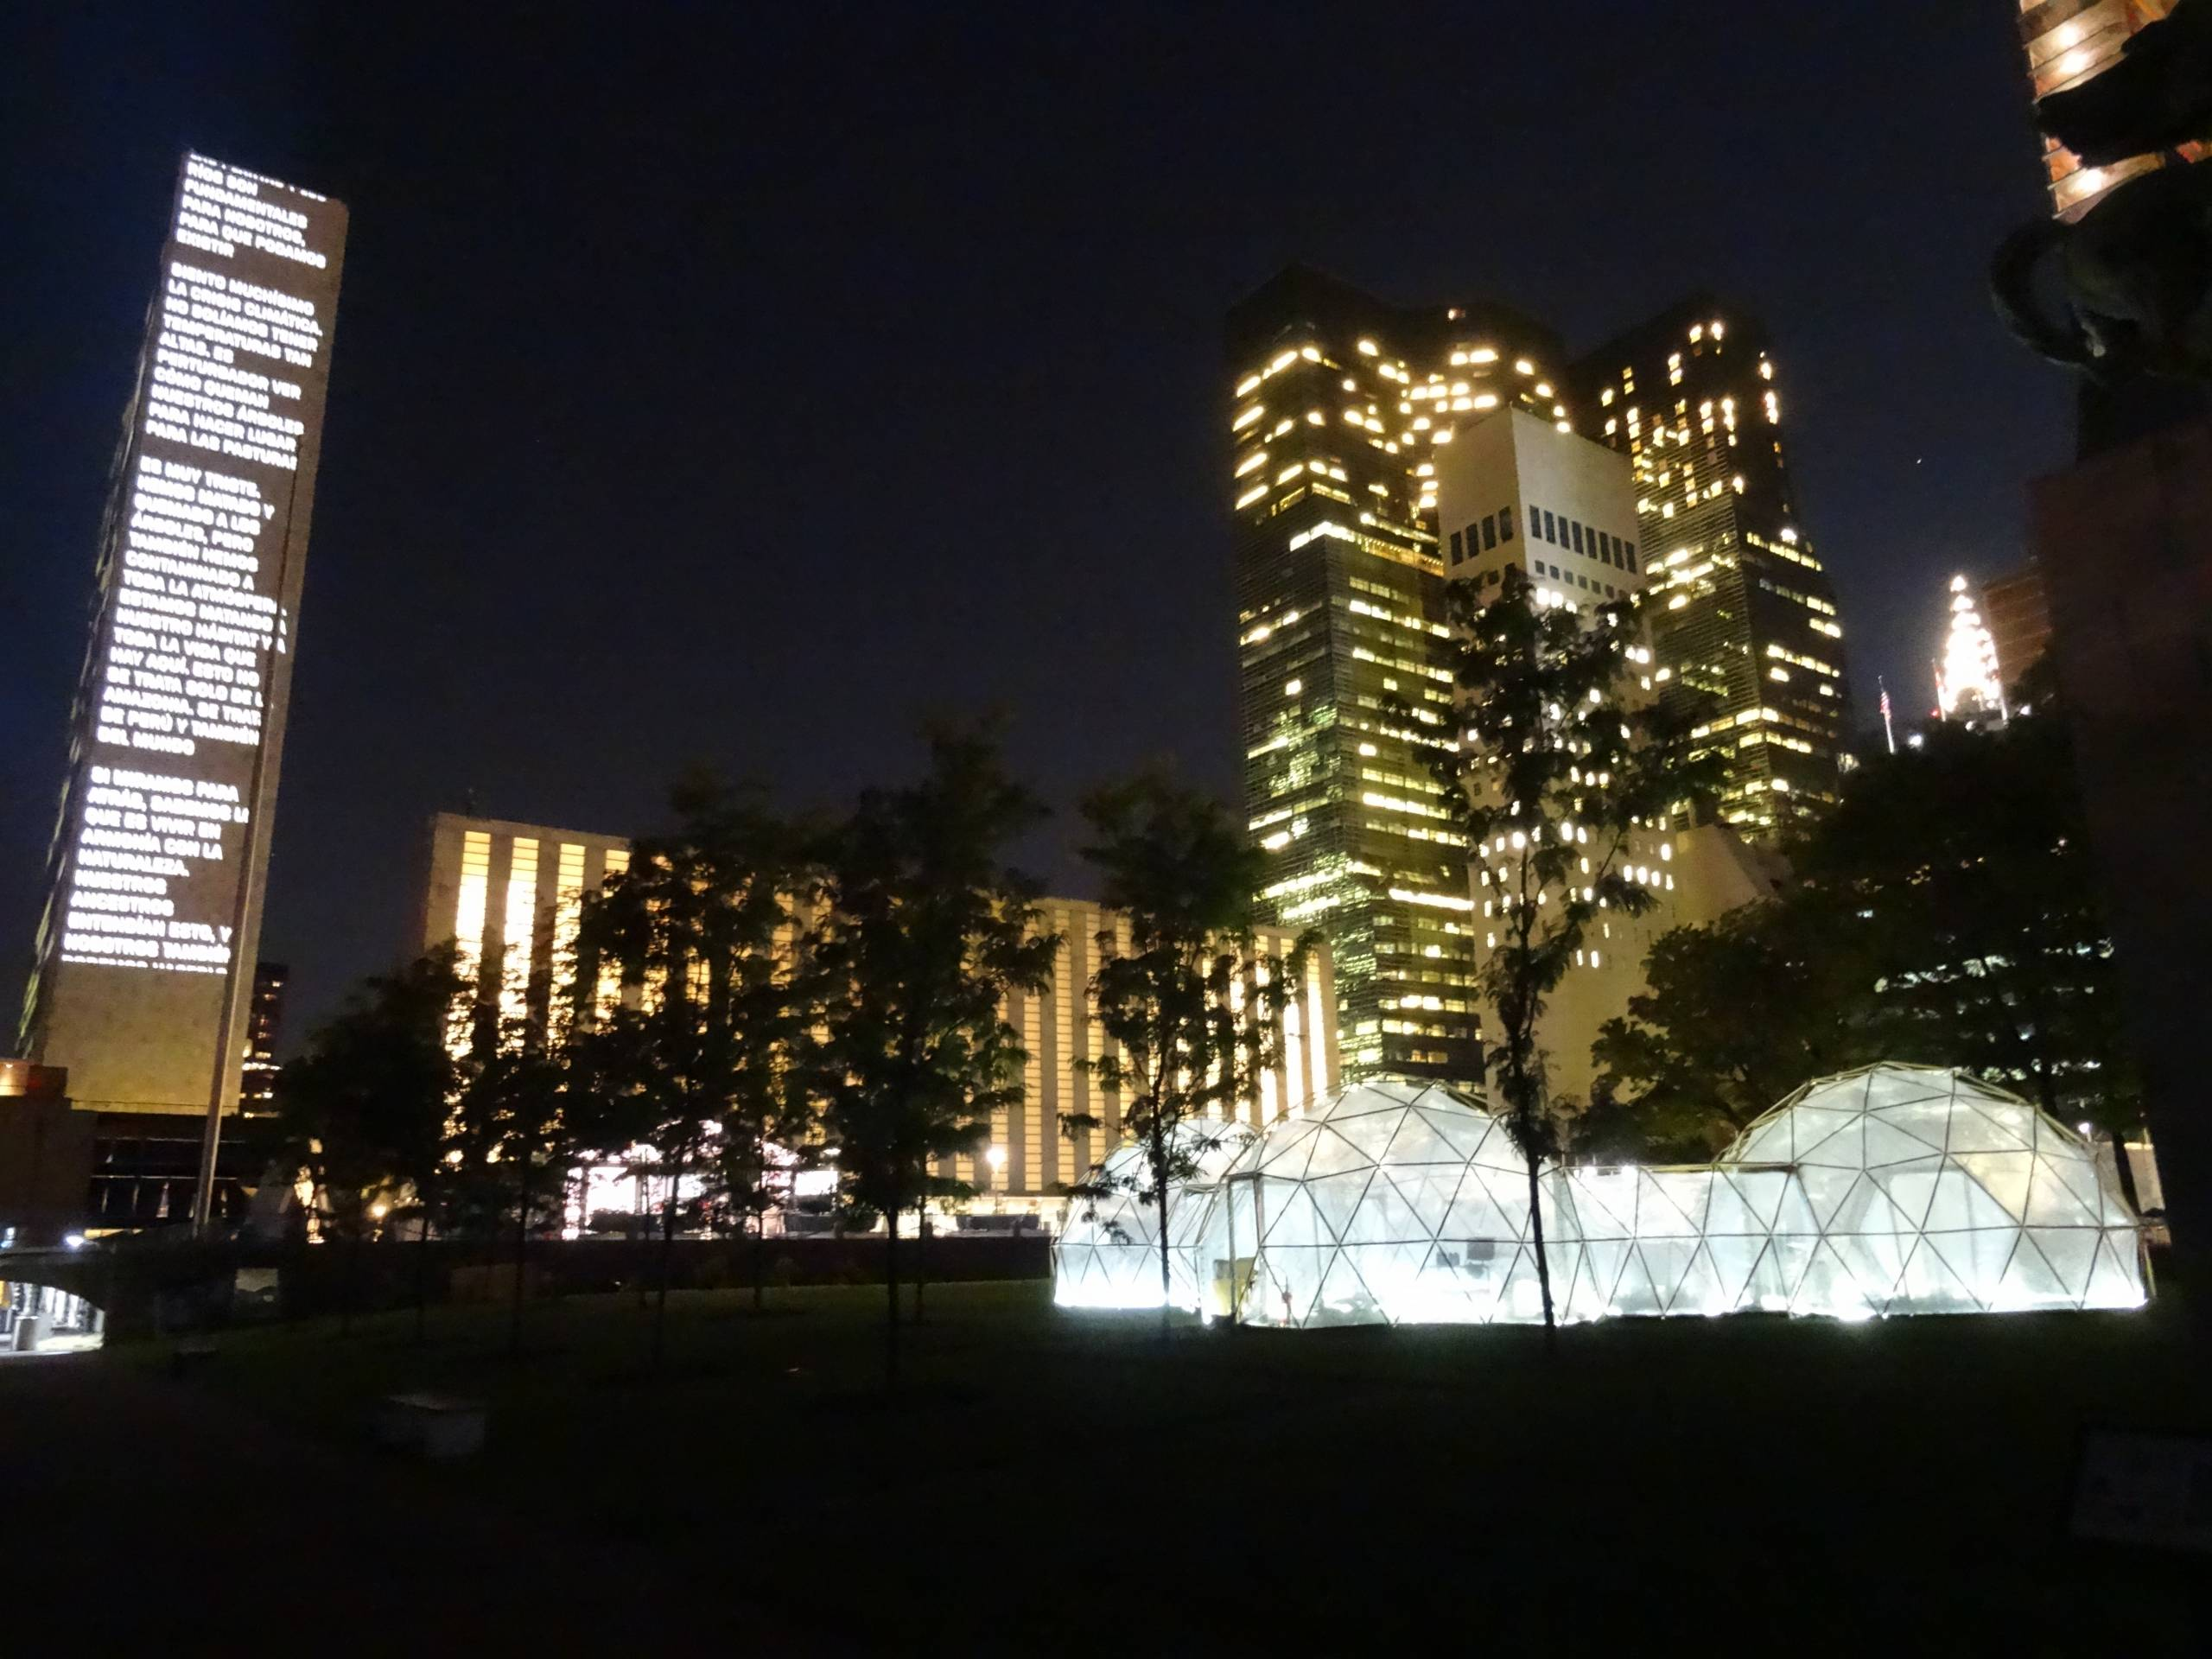 biome artwork against cityscape background